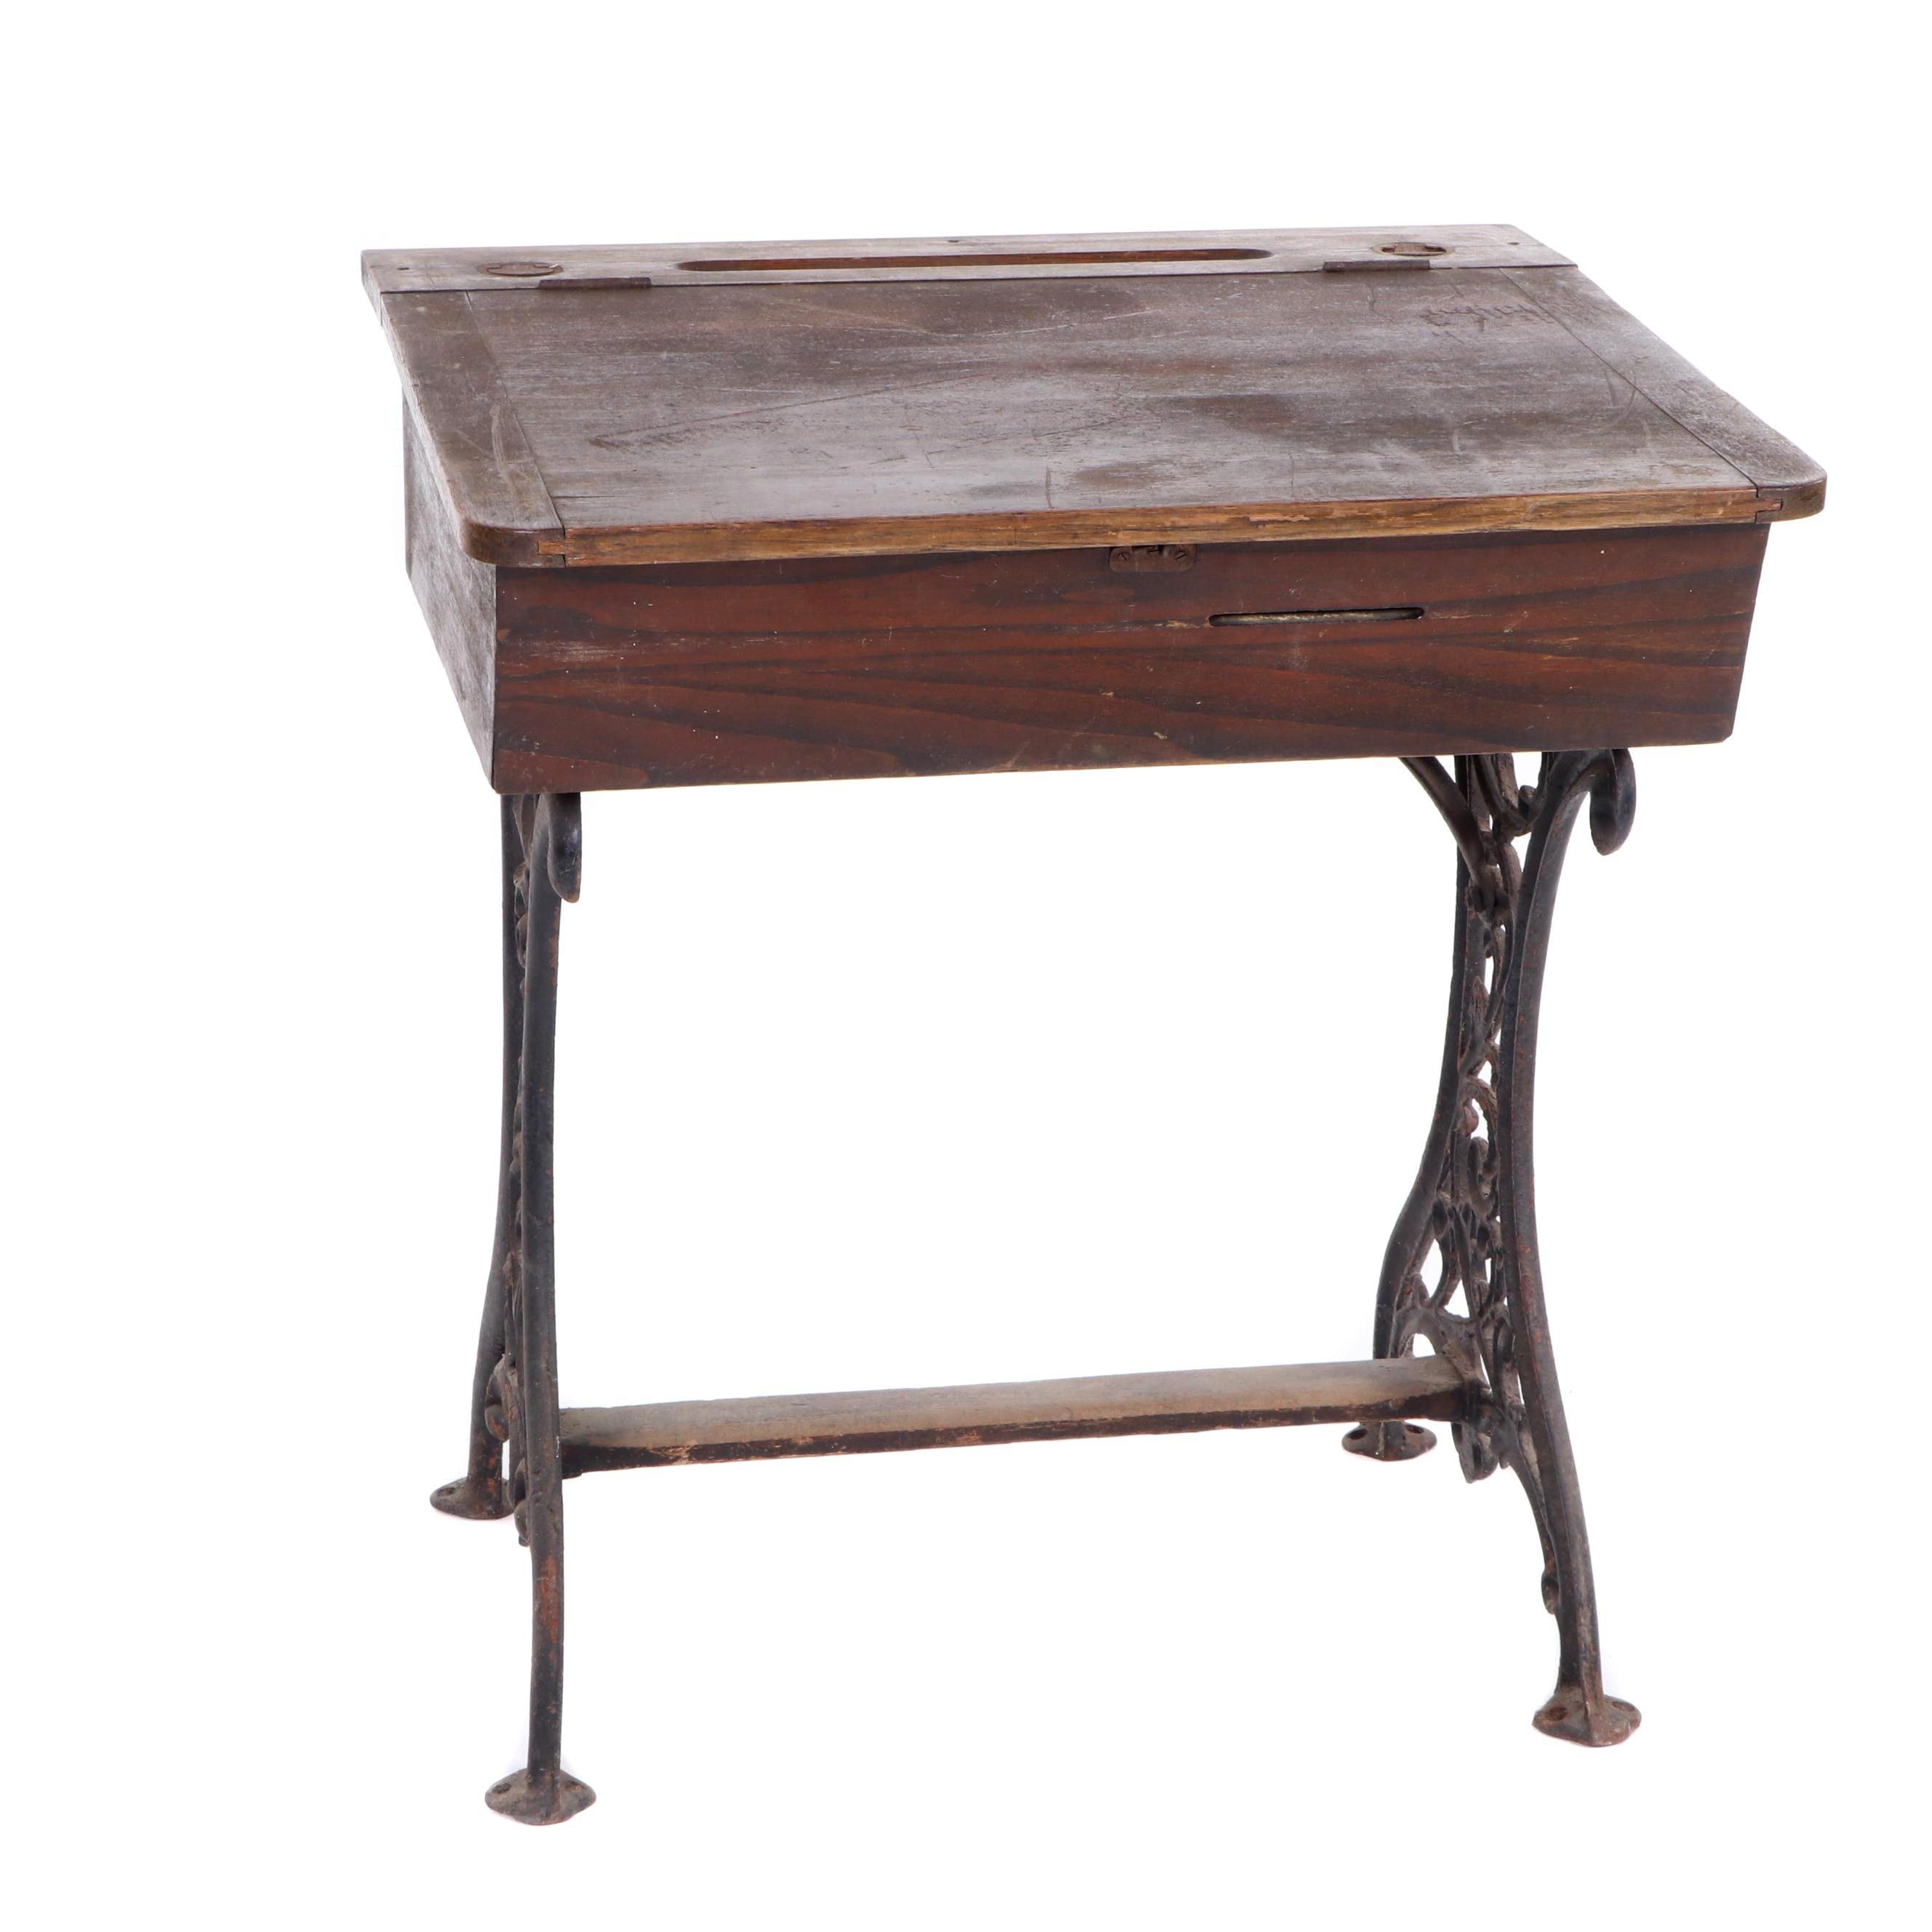 Oak and Cast Iron School Desk, Late 19th Century